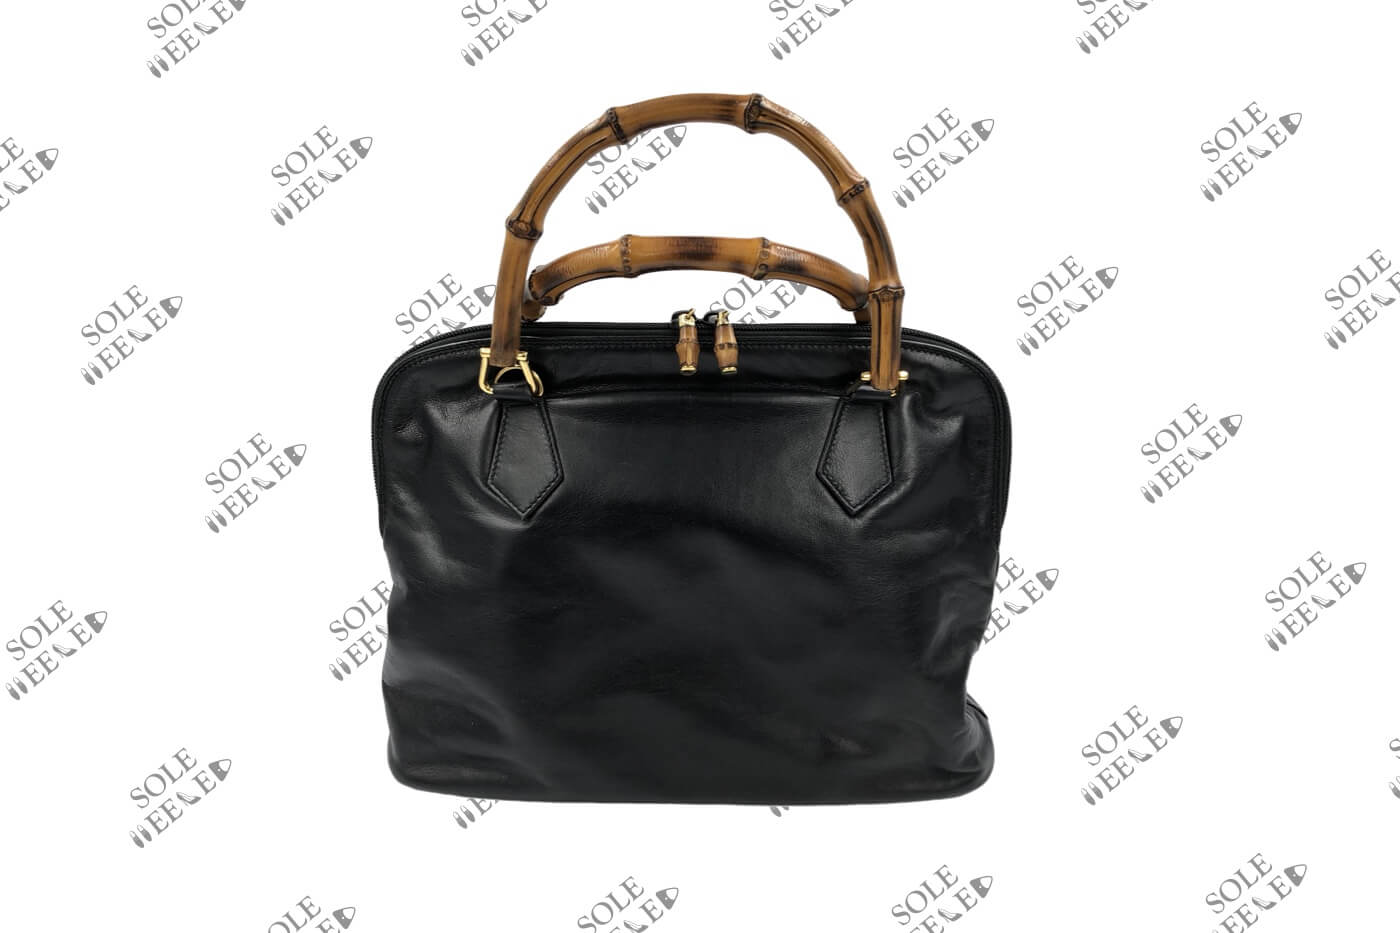 Gucci Handbag Strap Repair